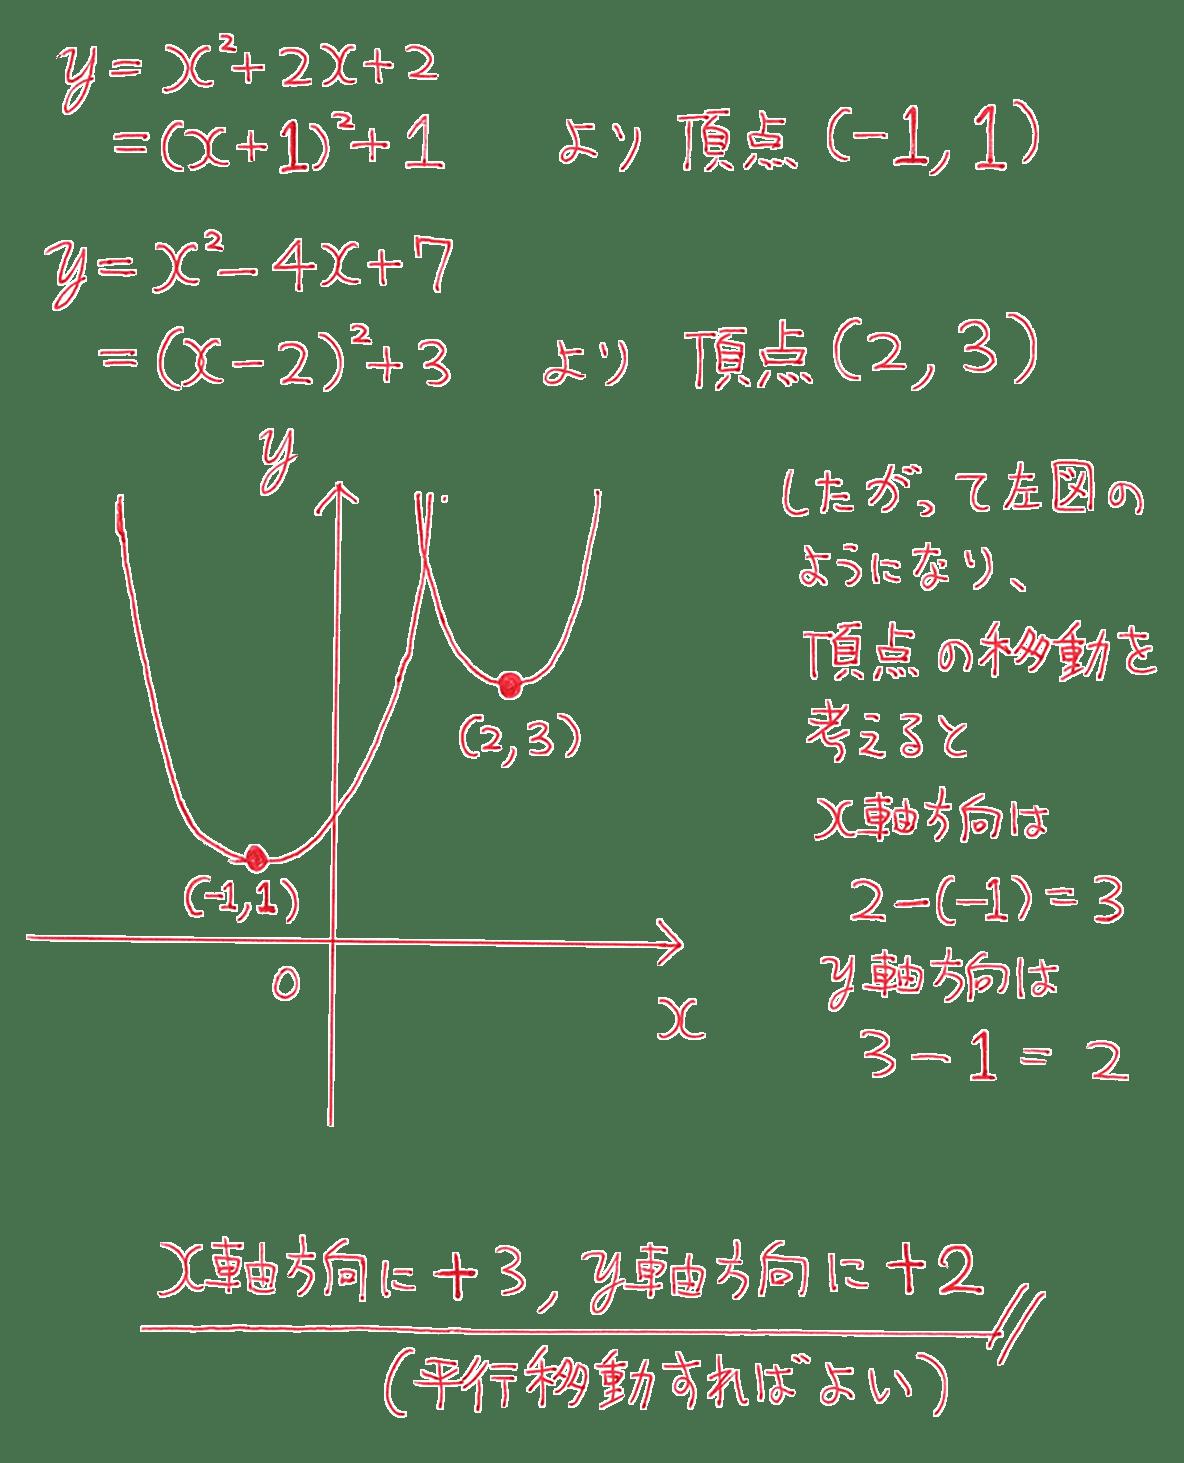 高校数学Ⅰ 2次関数16 練習の答え